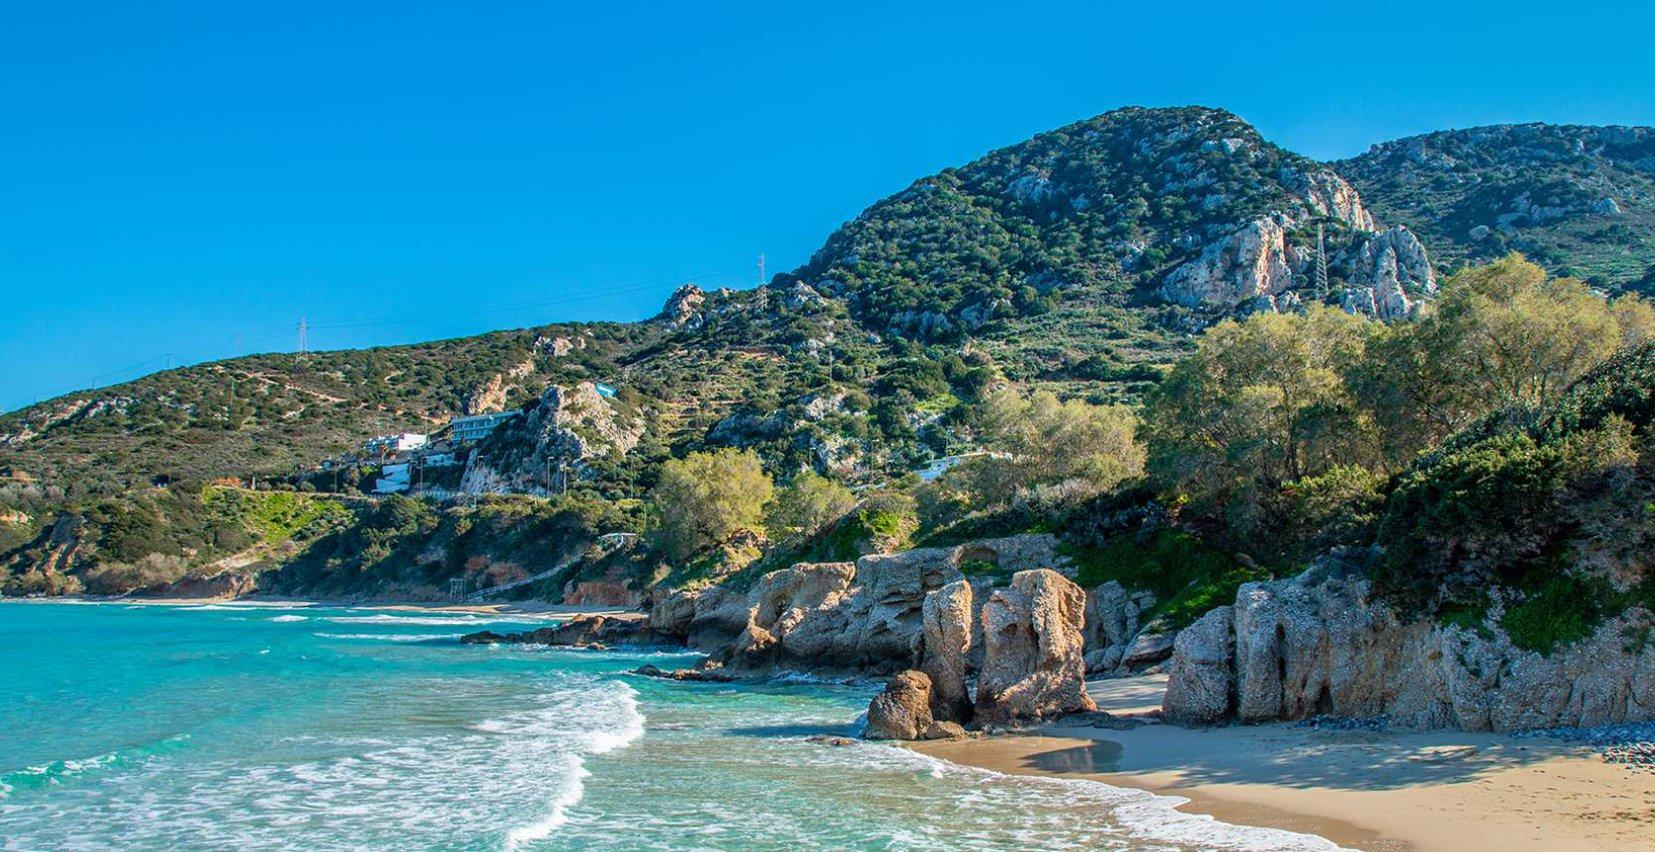 Enchanting beach surrounded by the mountains near Mala Villa